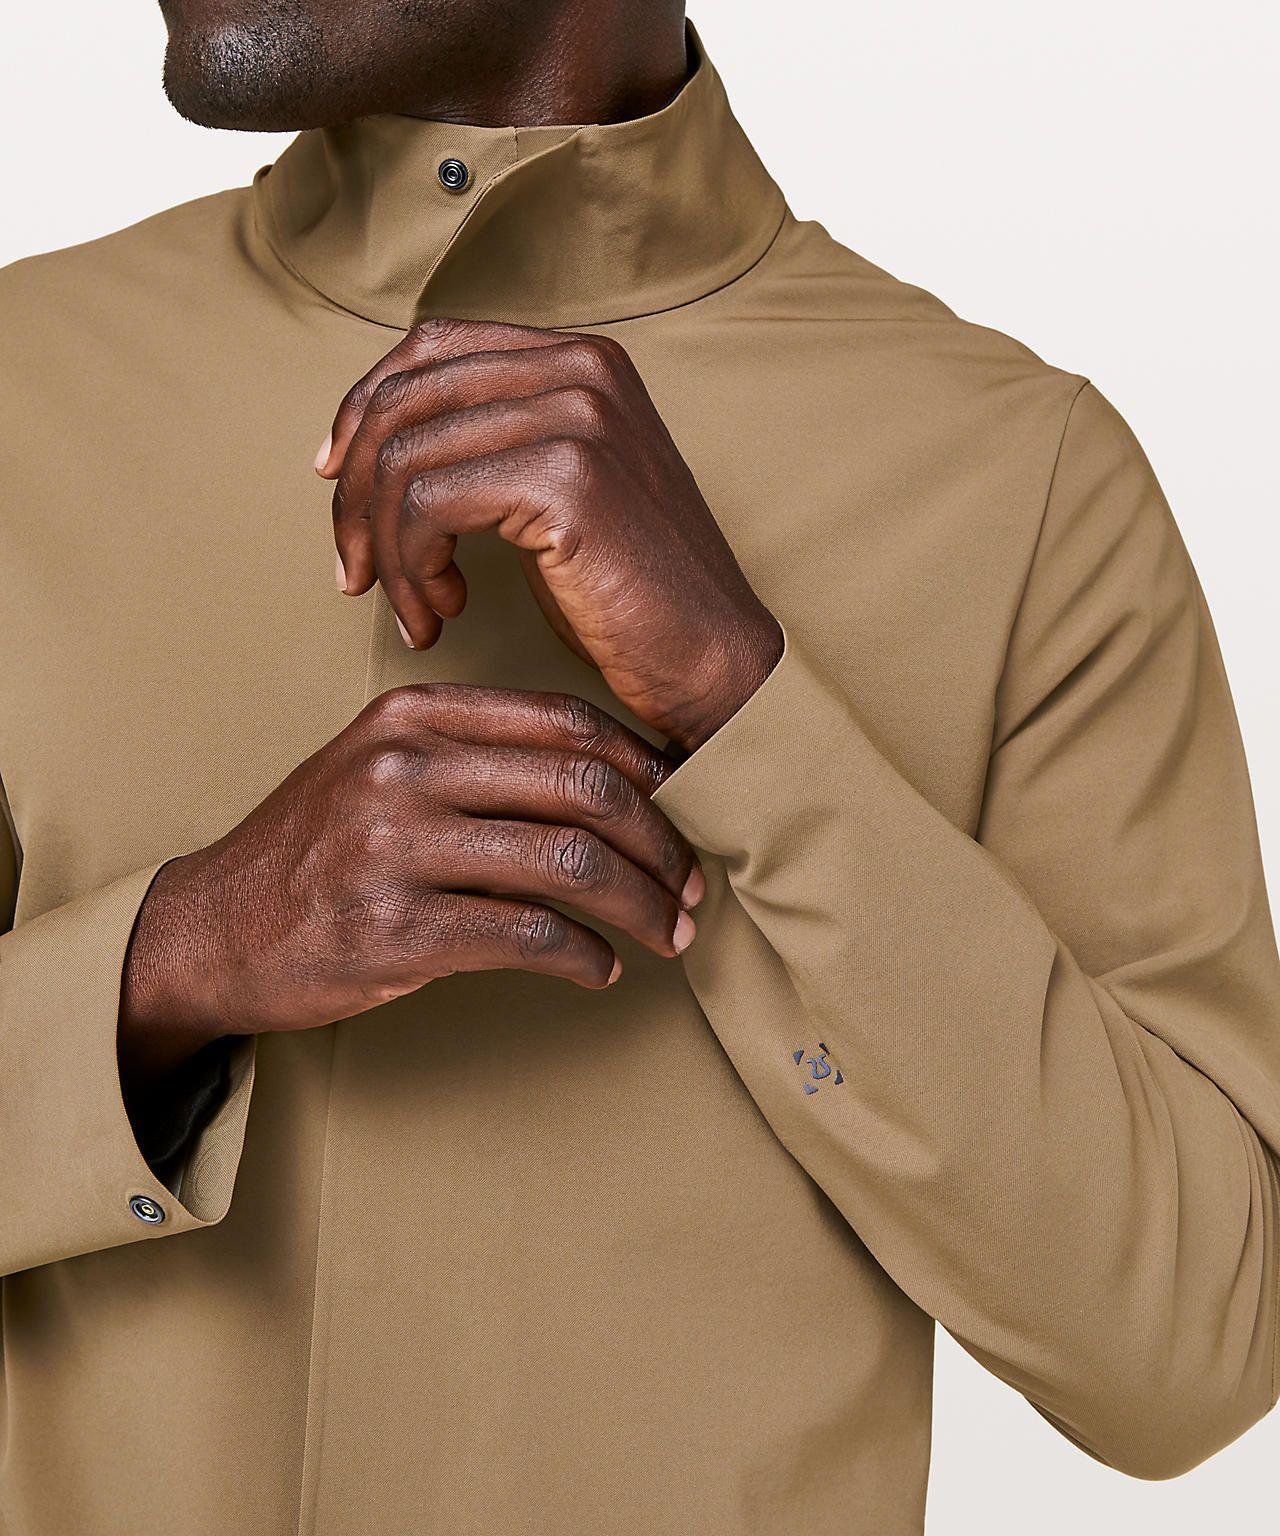 Drivers Coat Online Only Men S Jackets Hoodies Lululemon Mens Jackets Mens Coats Men [ 1536 x 1280 Pixel ]